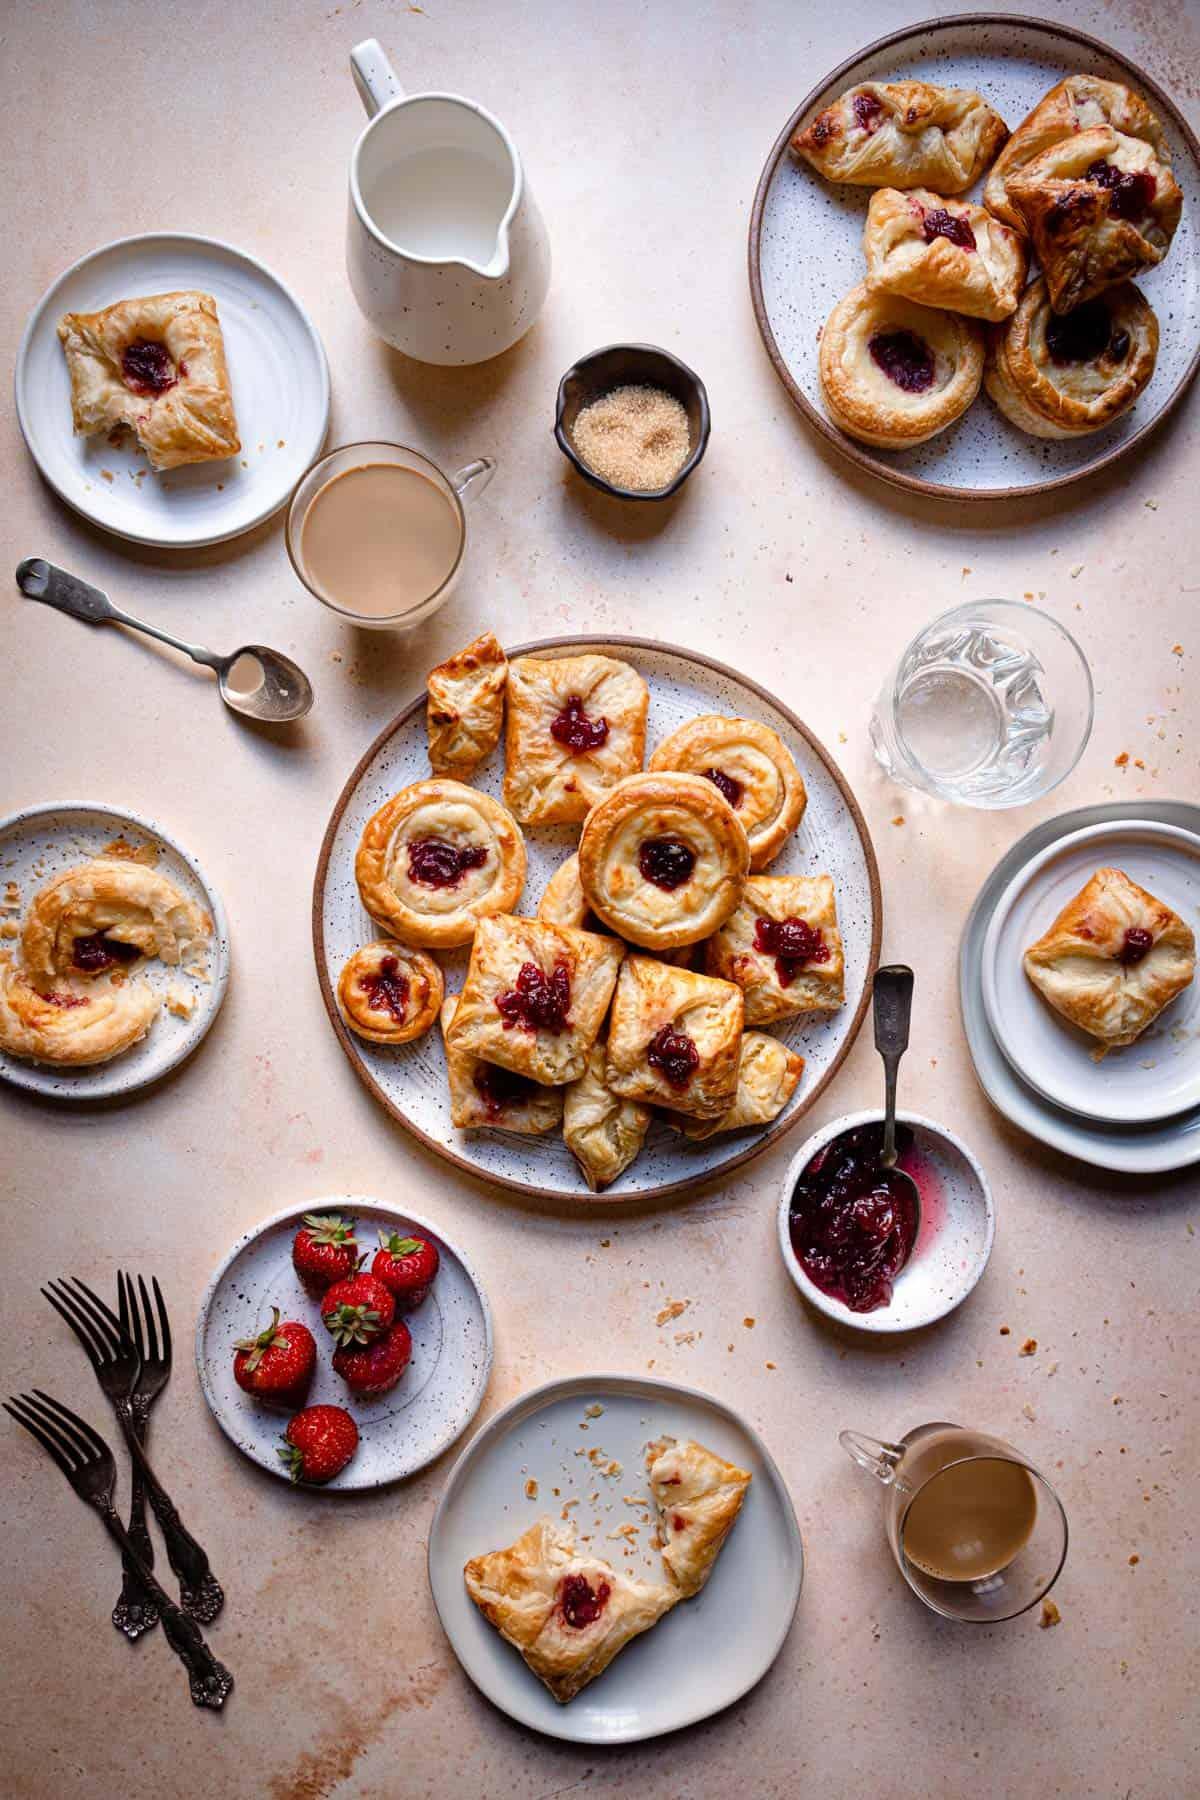 Cream Cheese Breakfast Pastries